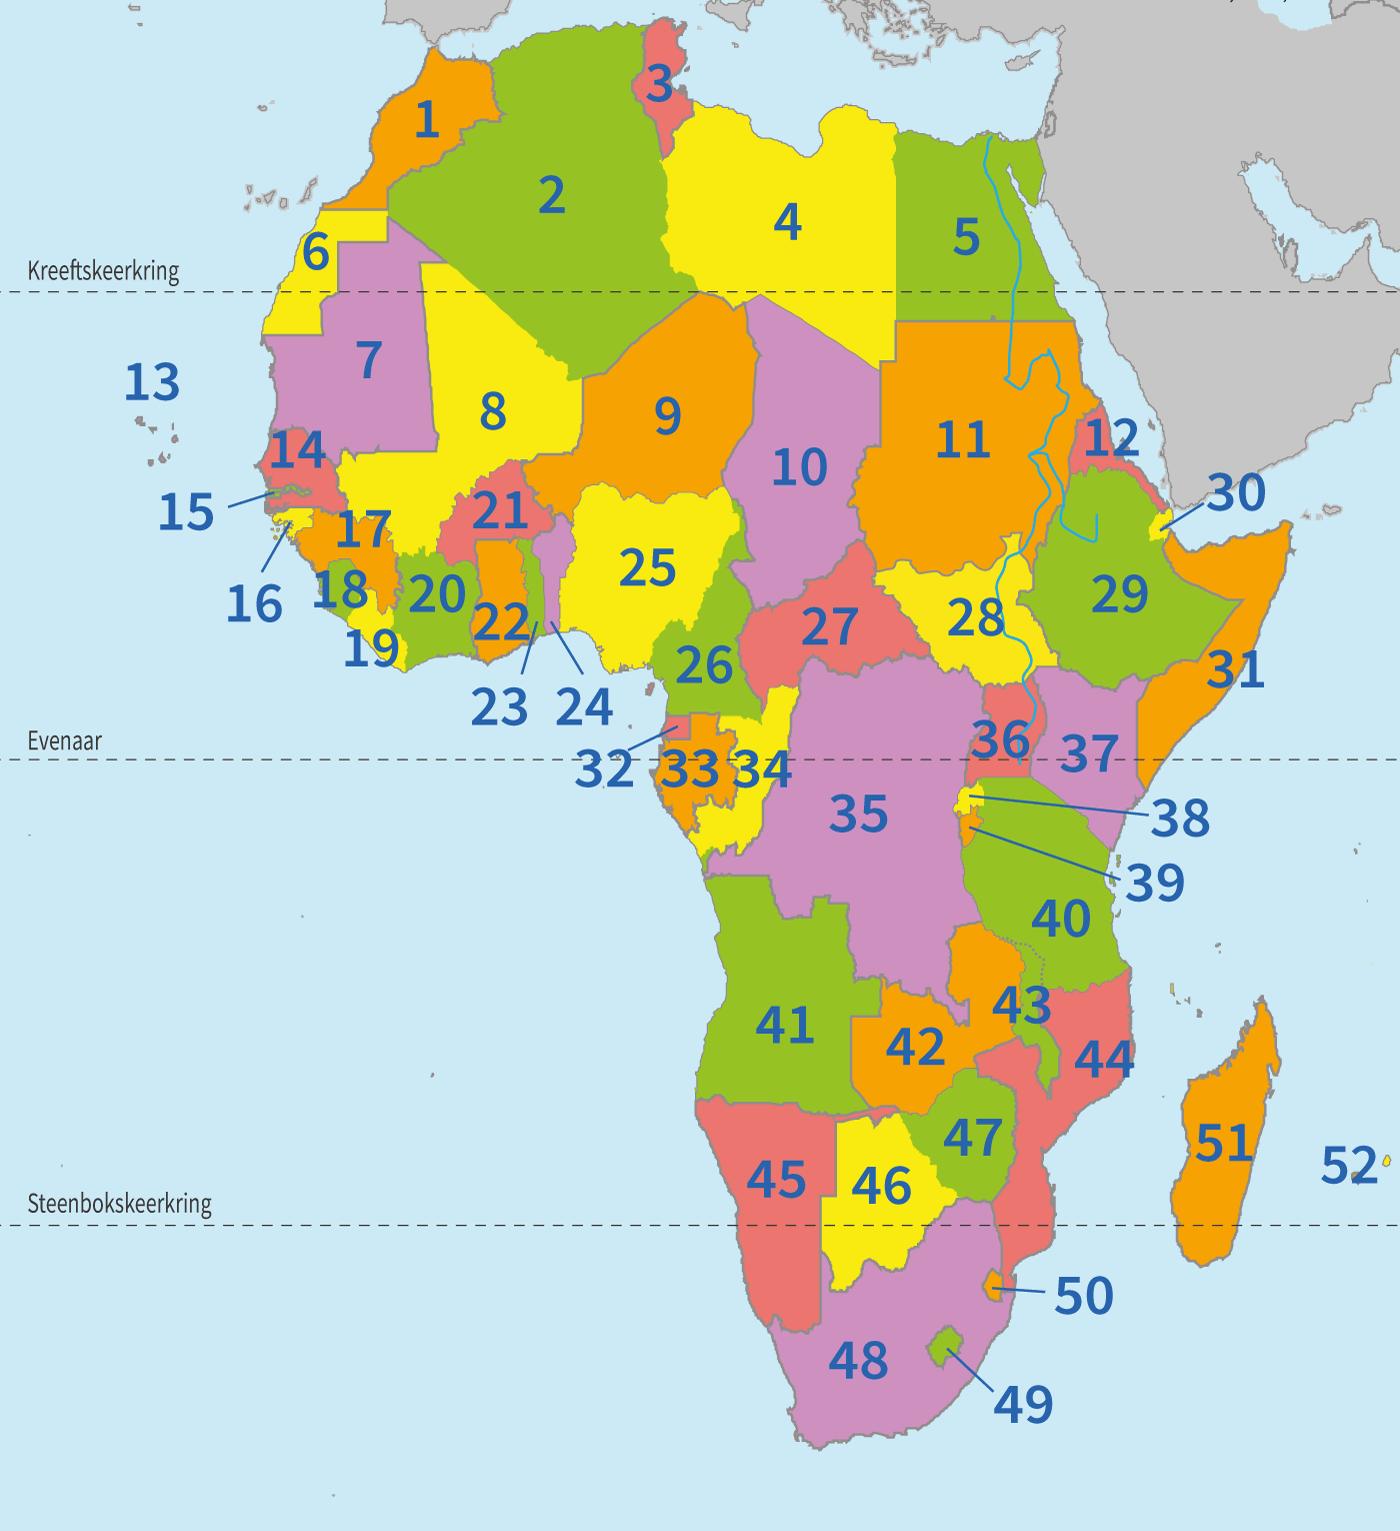 topo, topografie, Afrika, Afrikaanse landen, continent Afrika, aardrijkskunde, groep 8, Junior Einstein